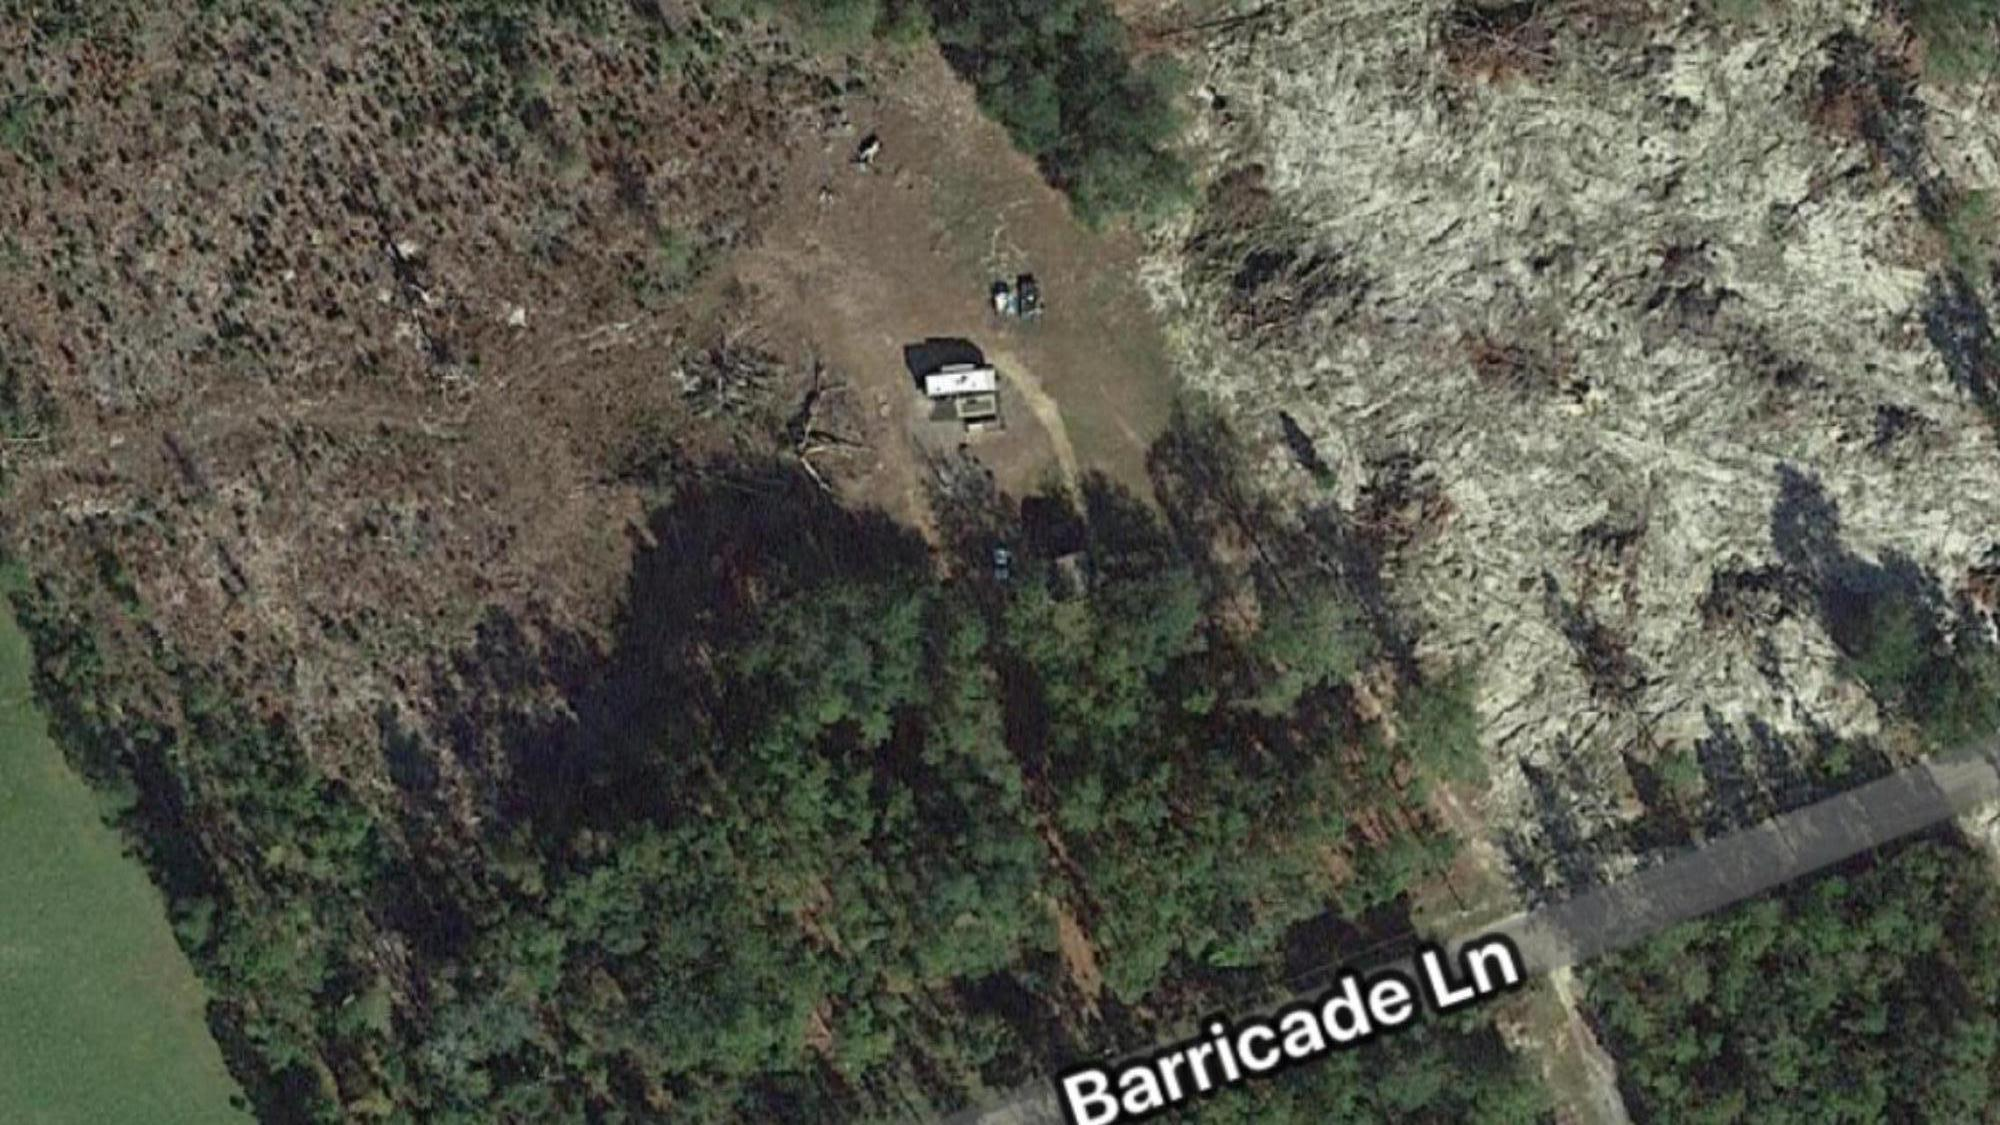 358 Barricade Lane Dorchester, SC 29437